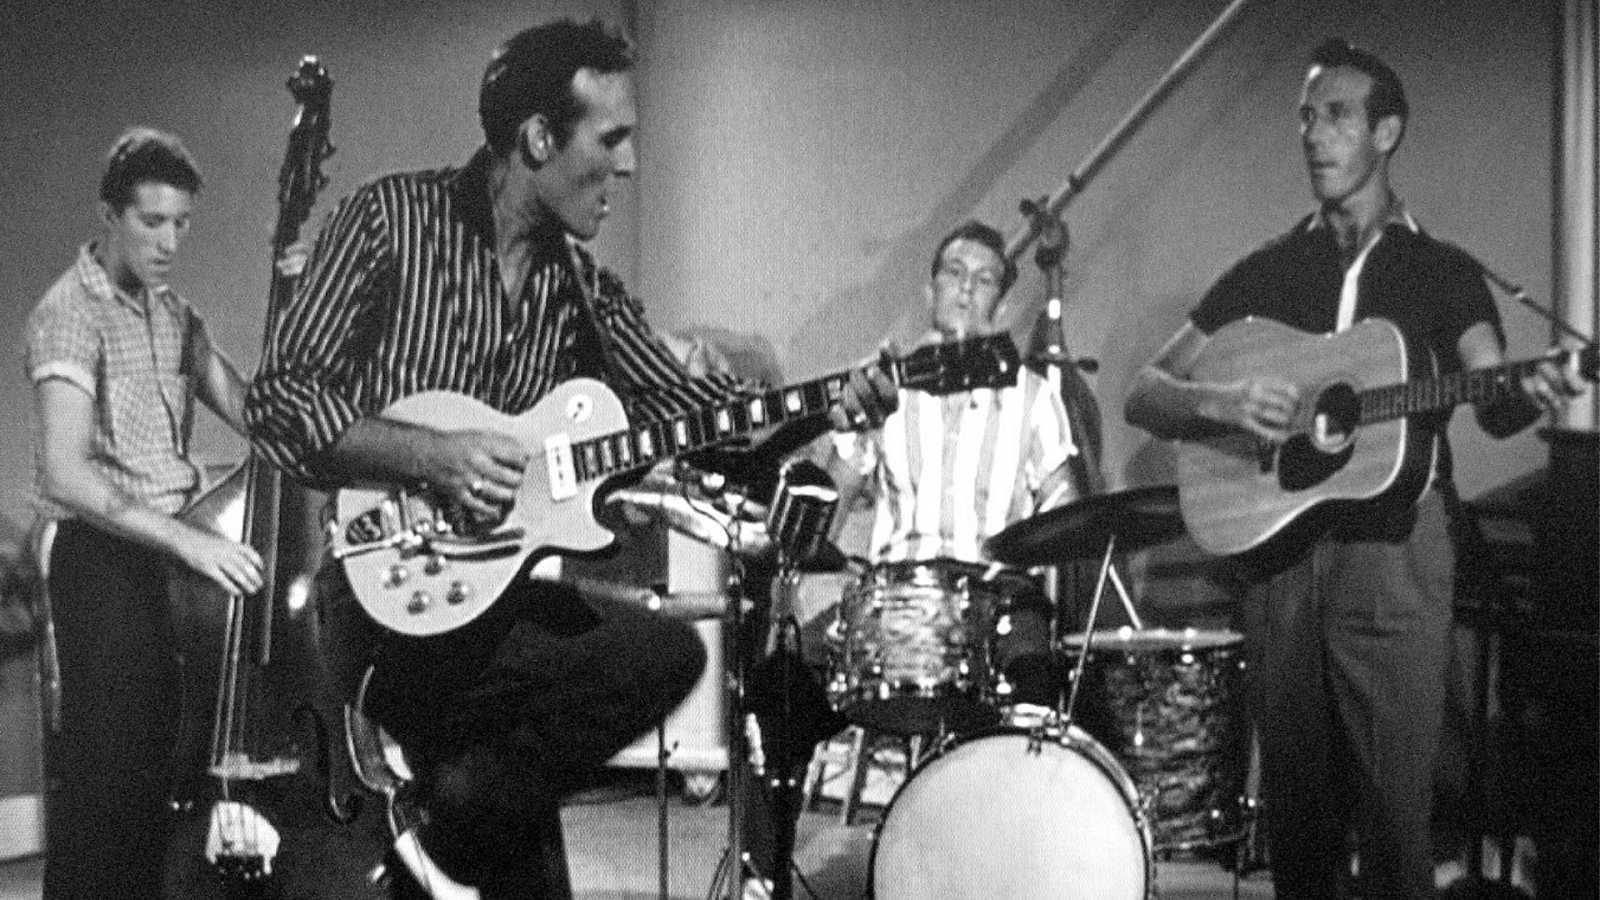 El sótano - Alternatively; Carl Perkins, Jerry Lee Lewis, Billy Riley,... - 10/06/21 - escuchar ahora